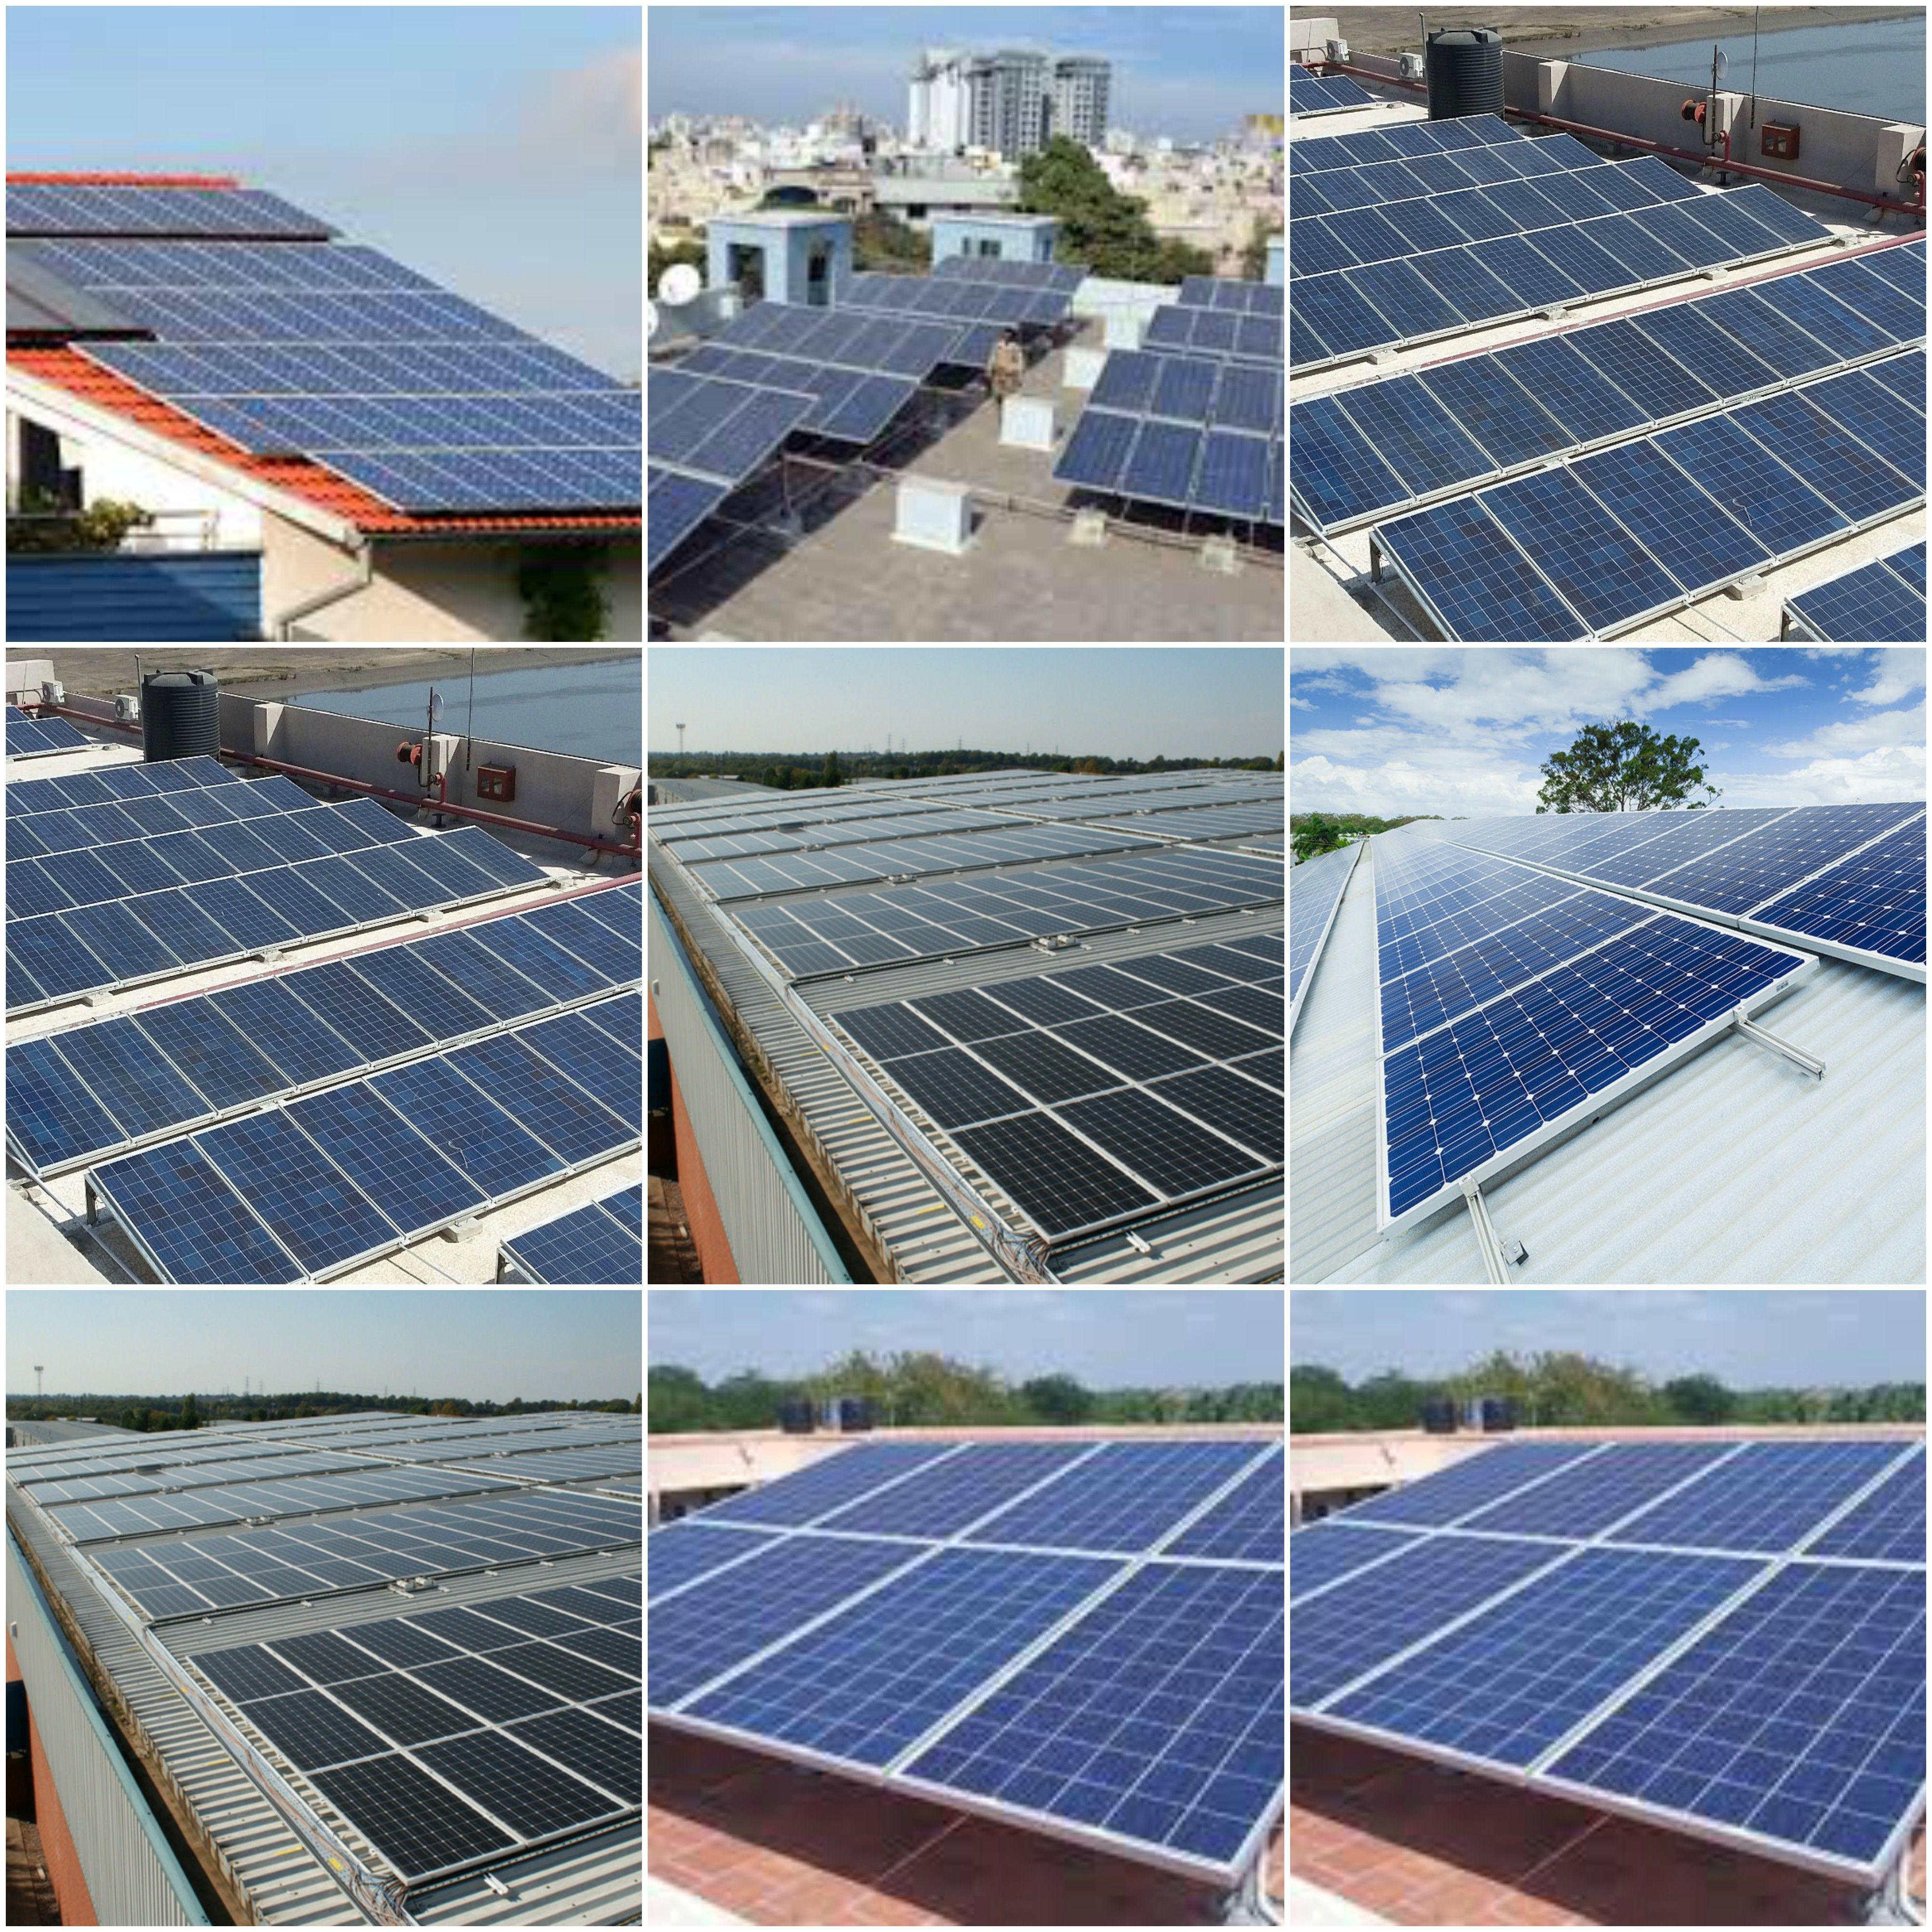 Renewable Energy Solar Sonnenkollektor Photovoltaik Anlagen